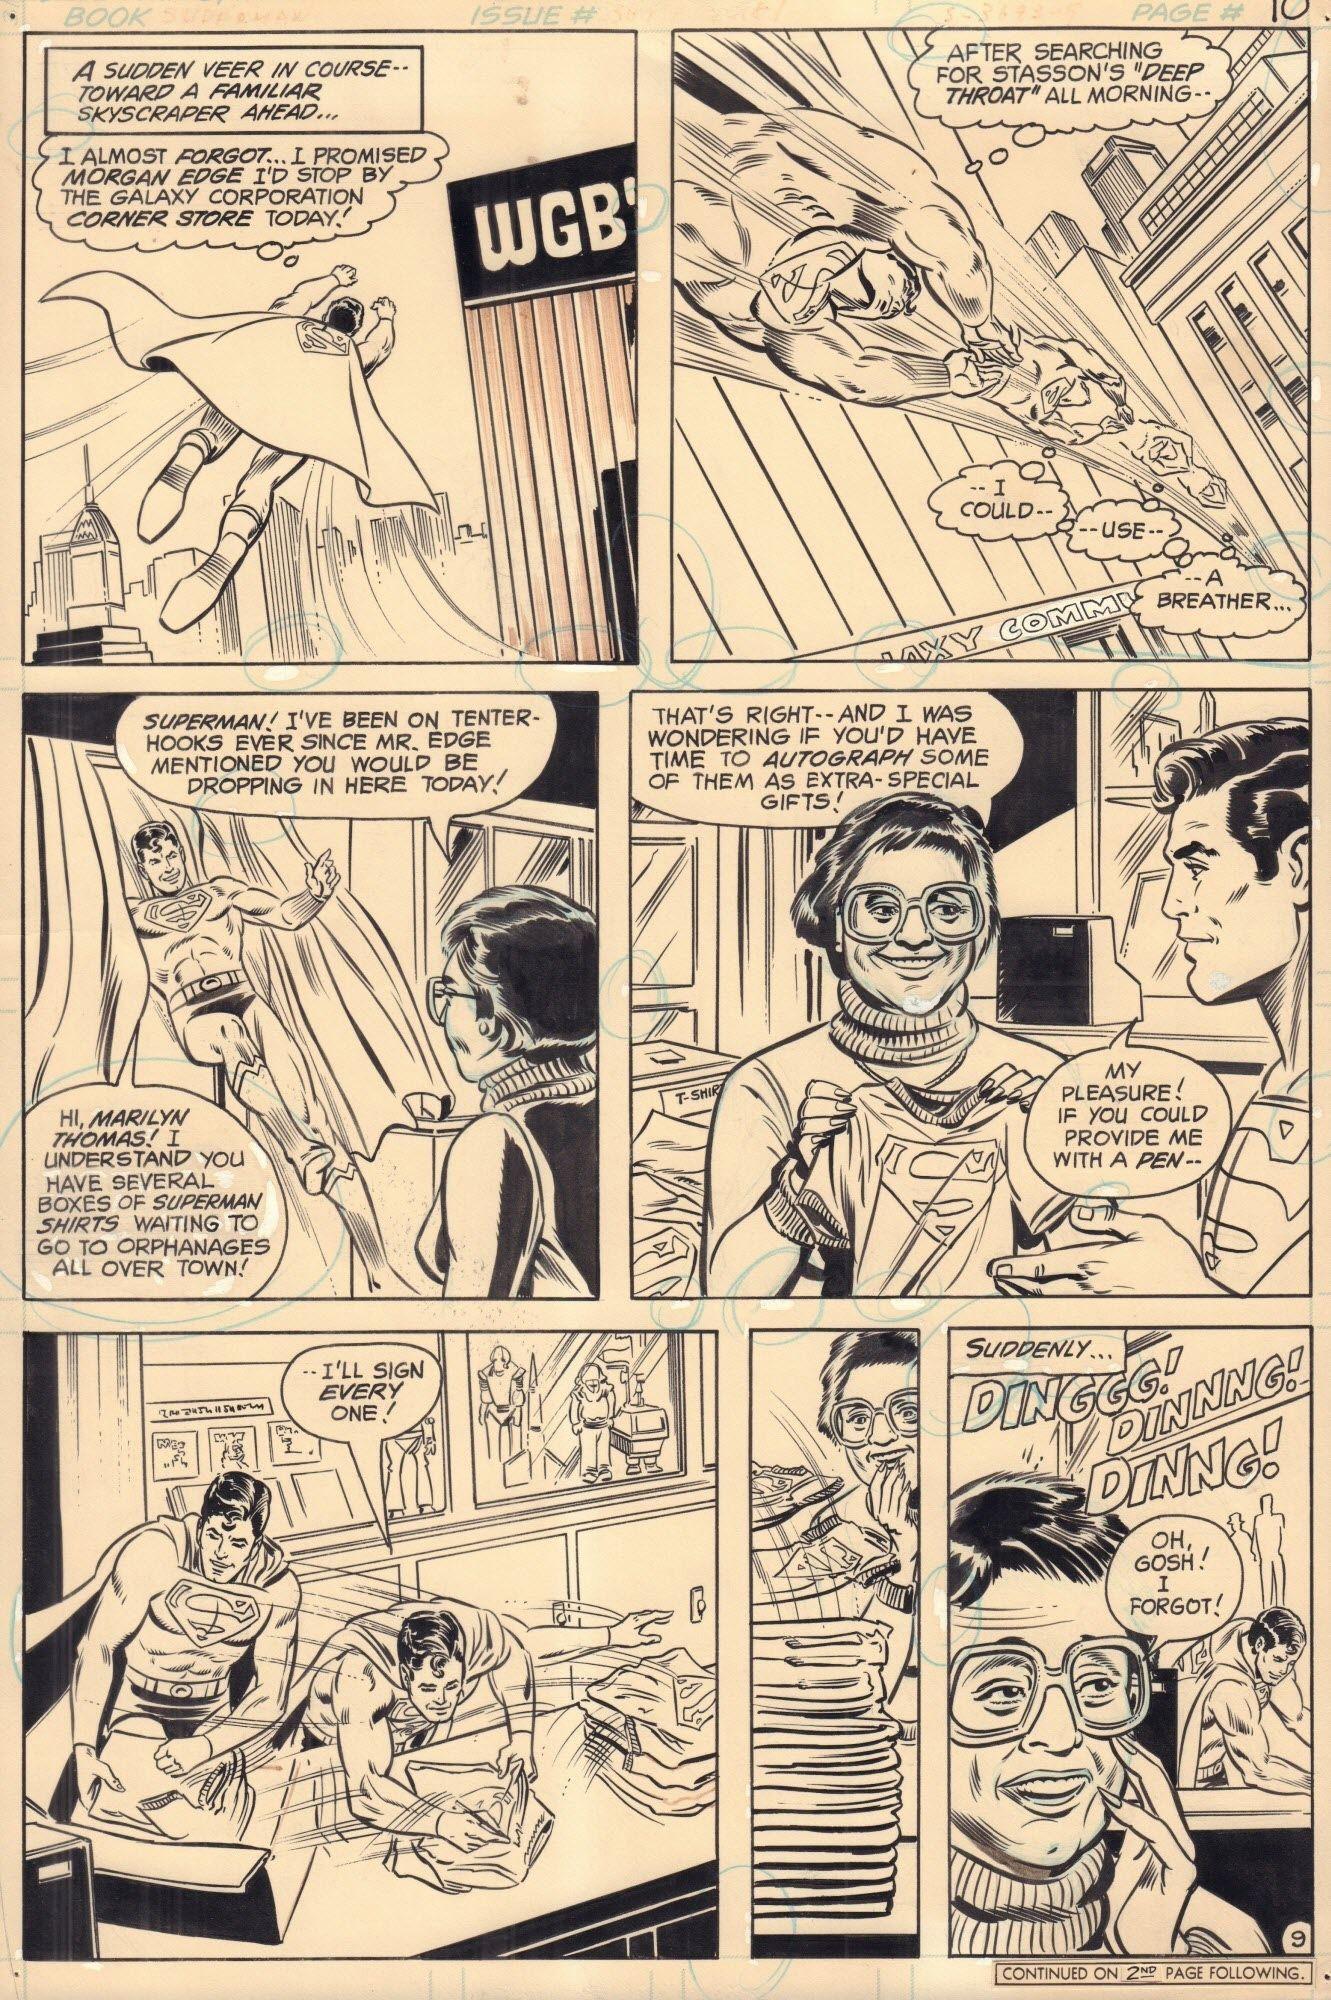 Superman #364 / 9